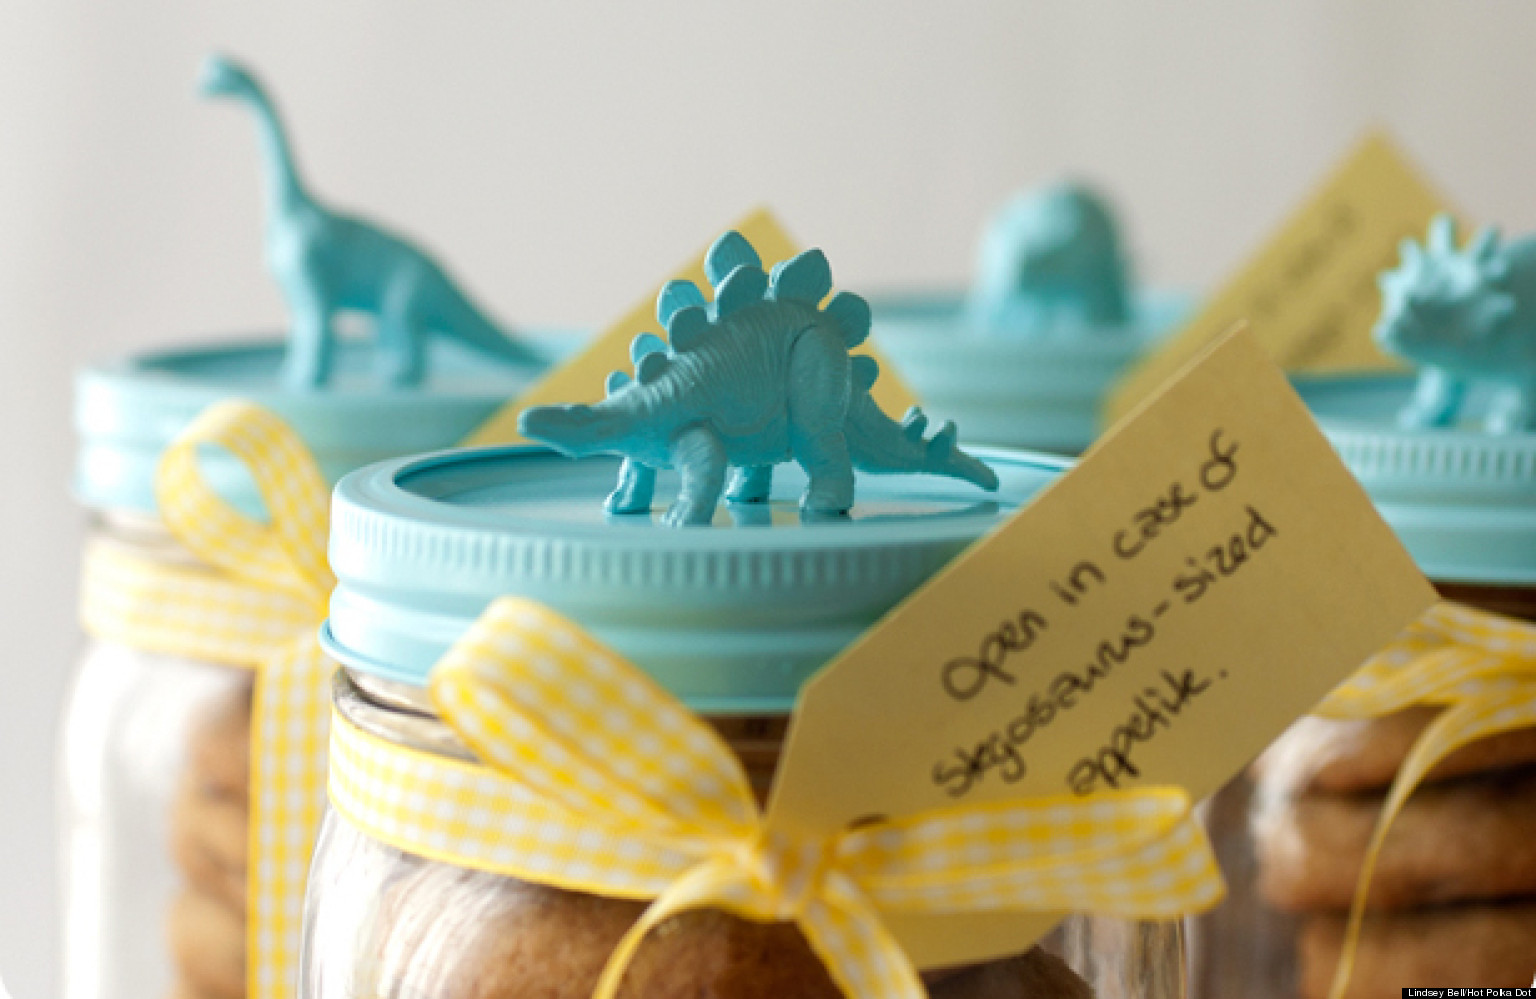 Diy Mason Jar Crafts Homemade Gifts For The Holidays